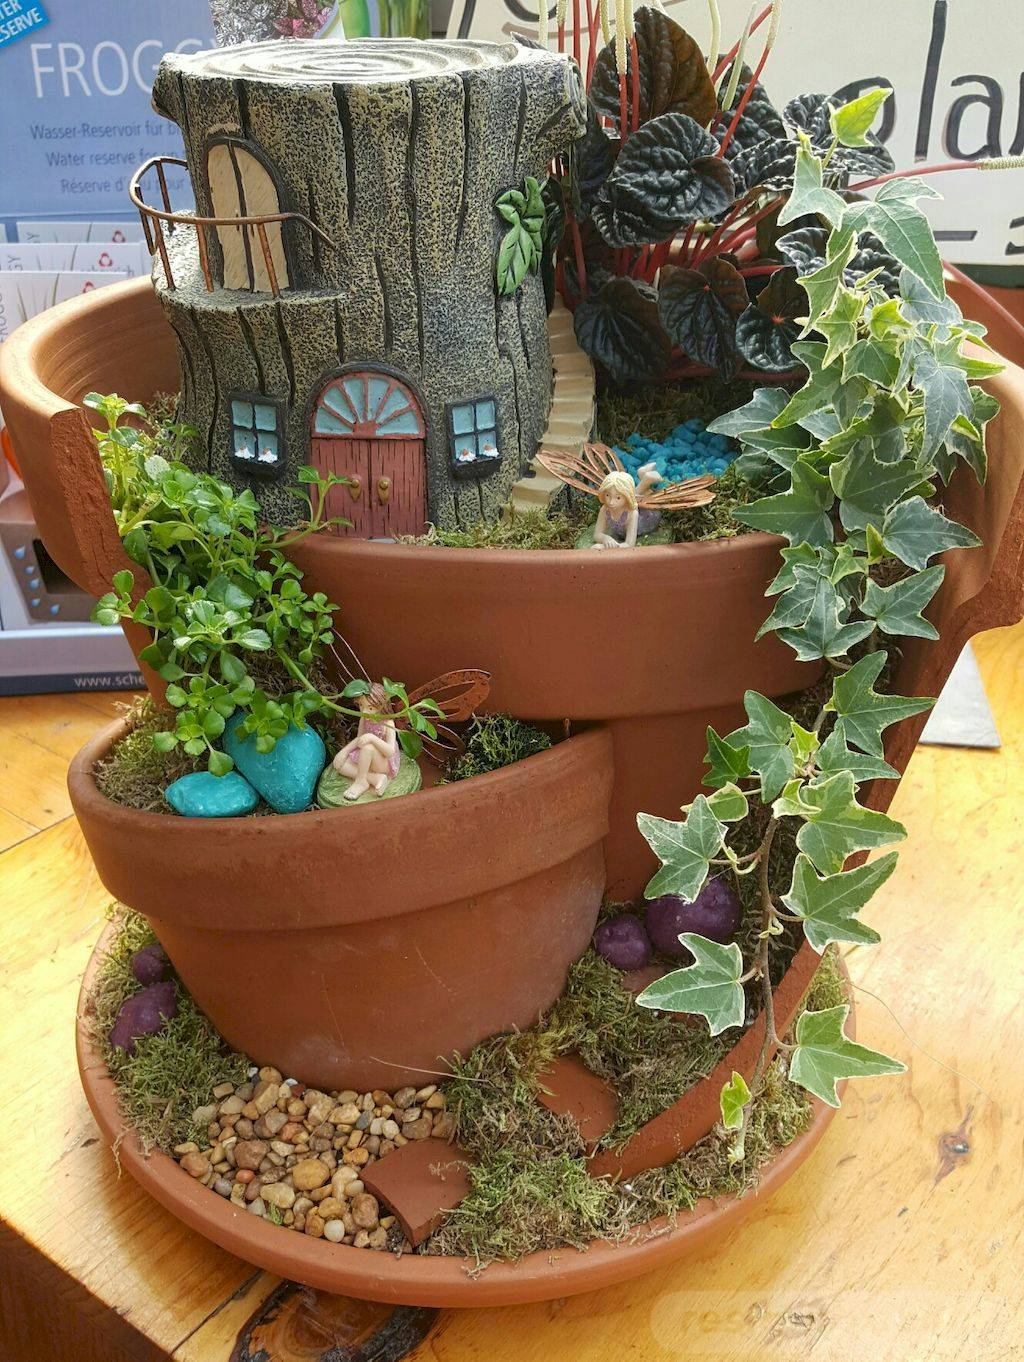 diy garden easy-789255903419603414